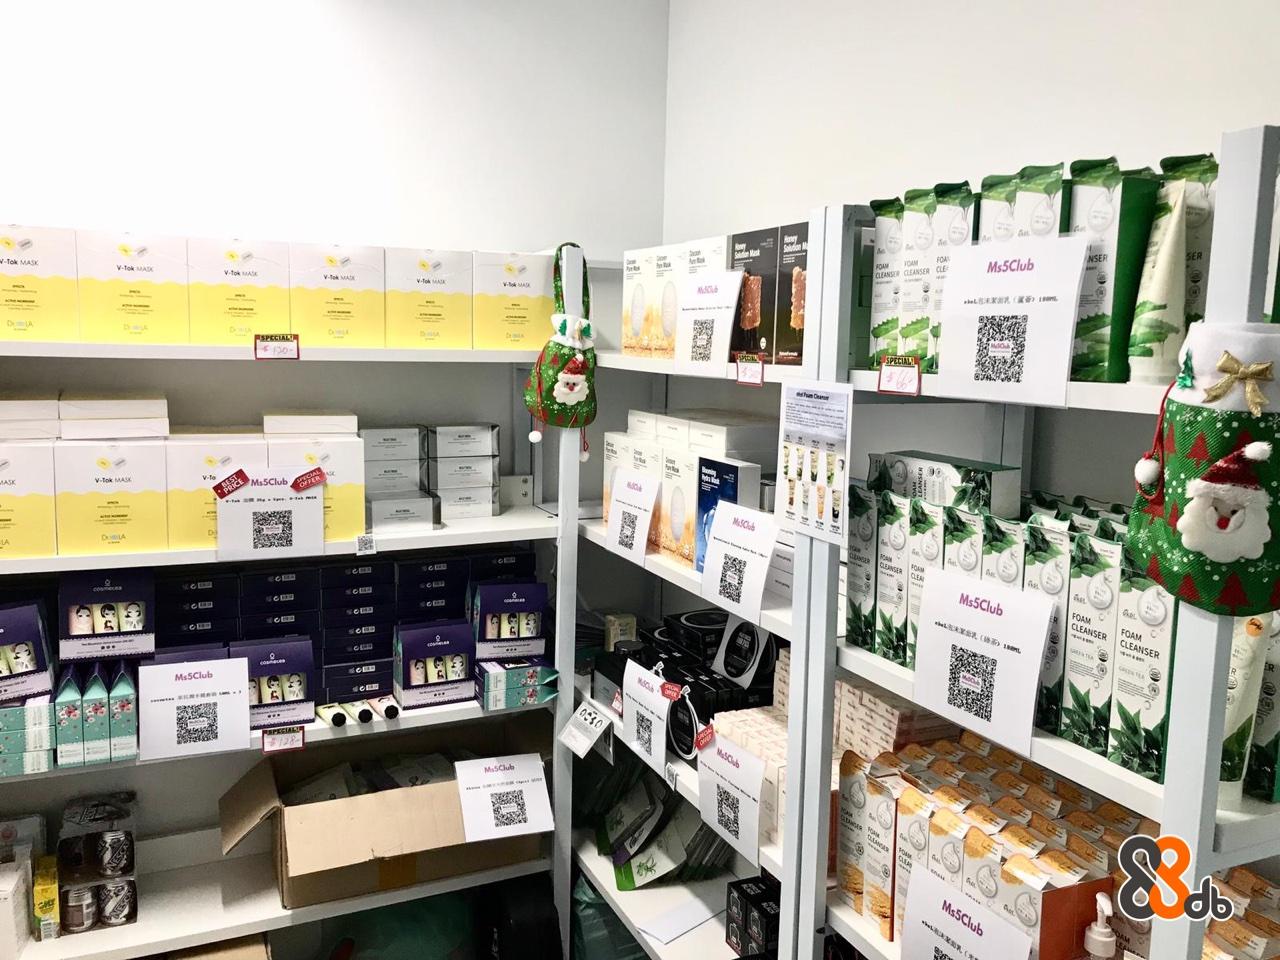 .Tok MASK CLEANSER CLEANSER CLE -tok MASK V-Tok MASK Ms5Club FOAM  Product,Retail,Building,Outlet store,Shelf